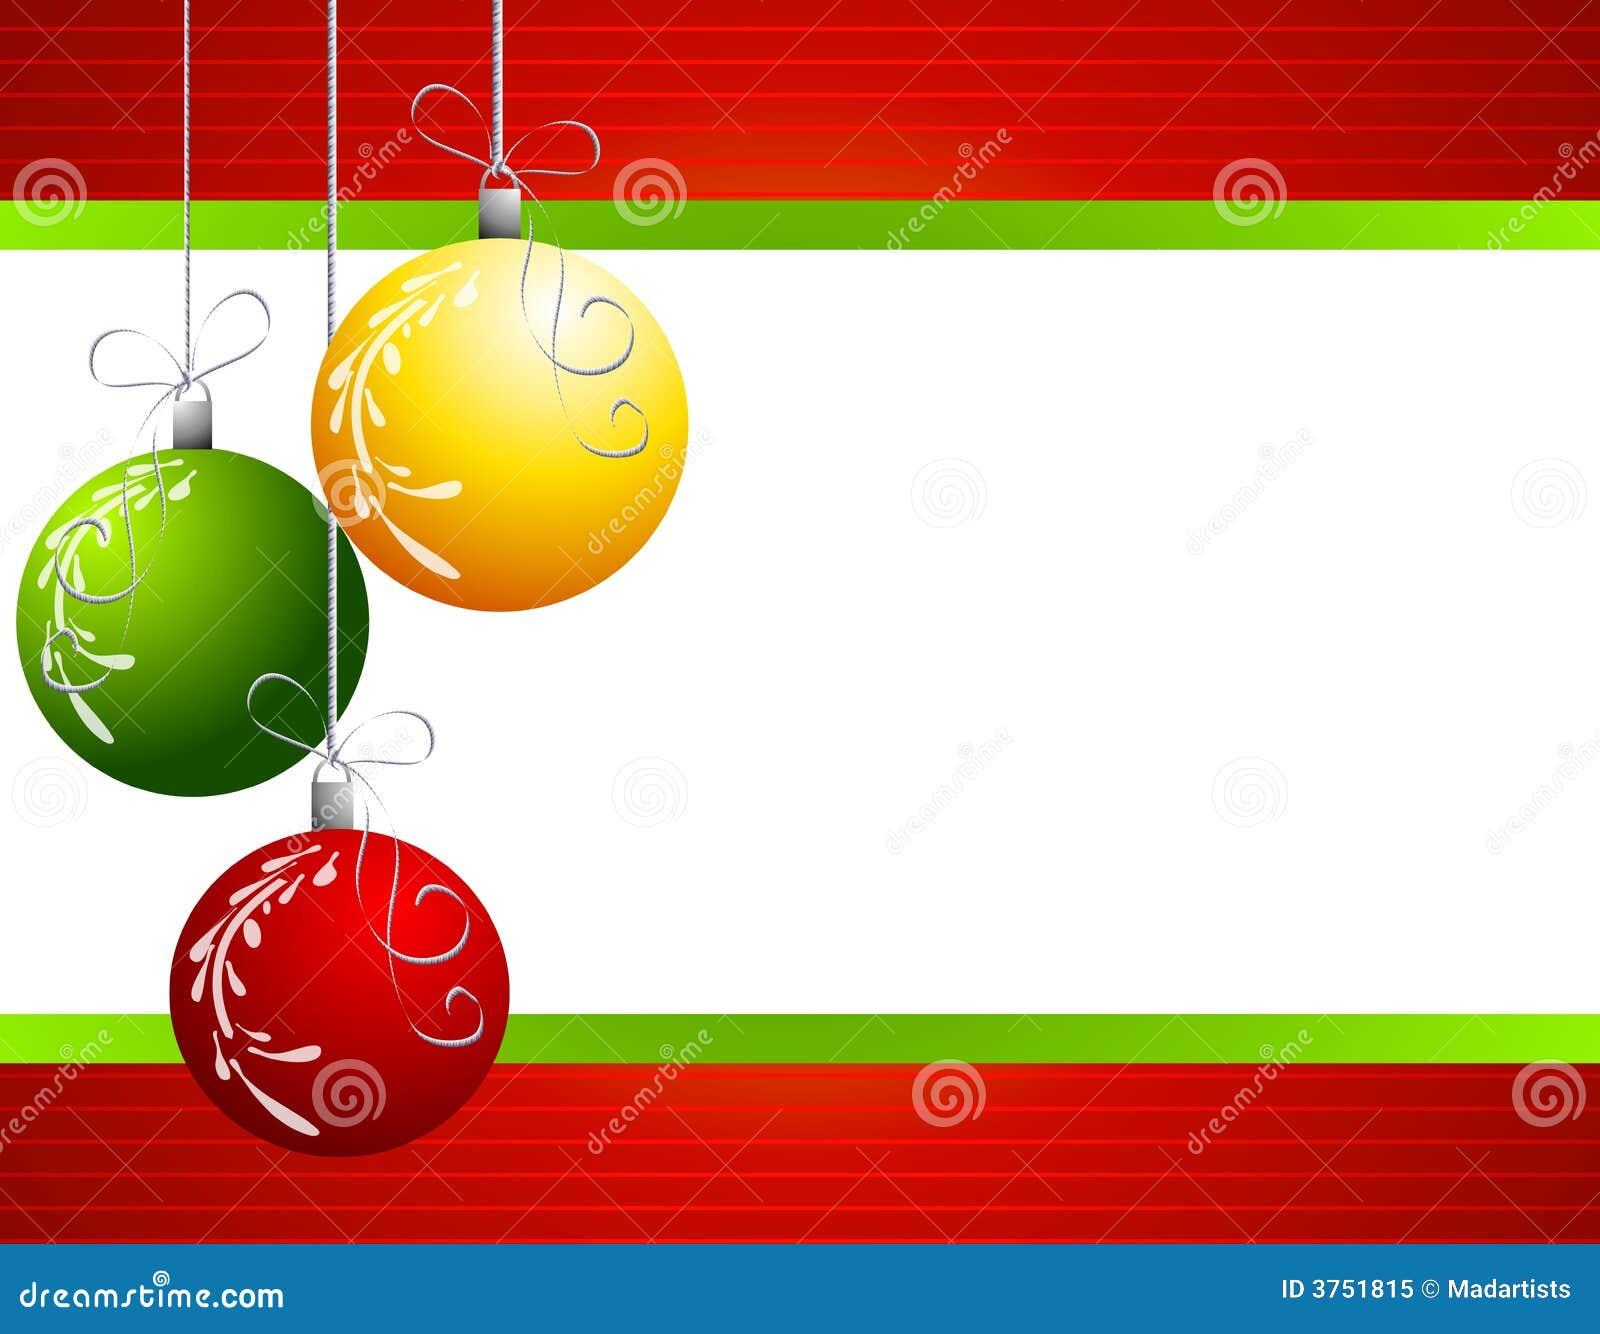 Related: Christmas Ball Ornament Clipart , Christmas Ornament Outline ...